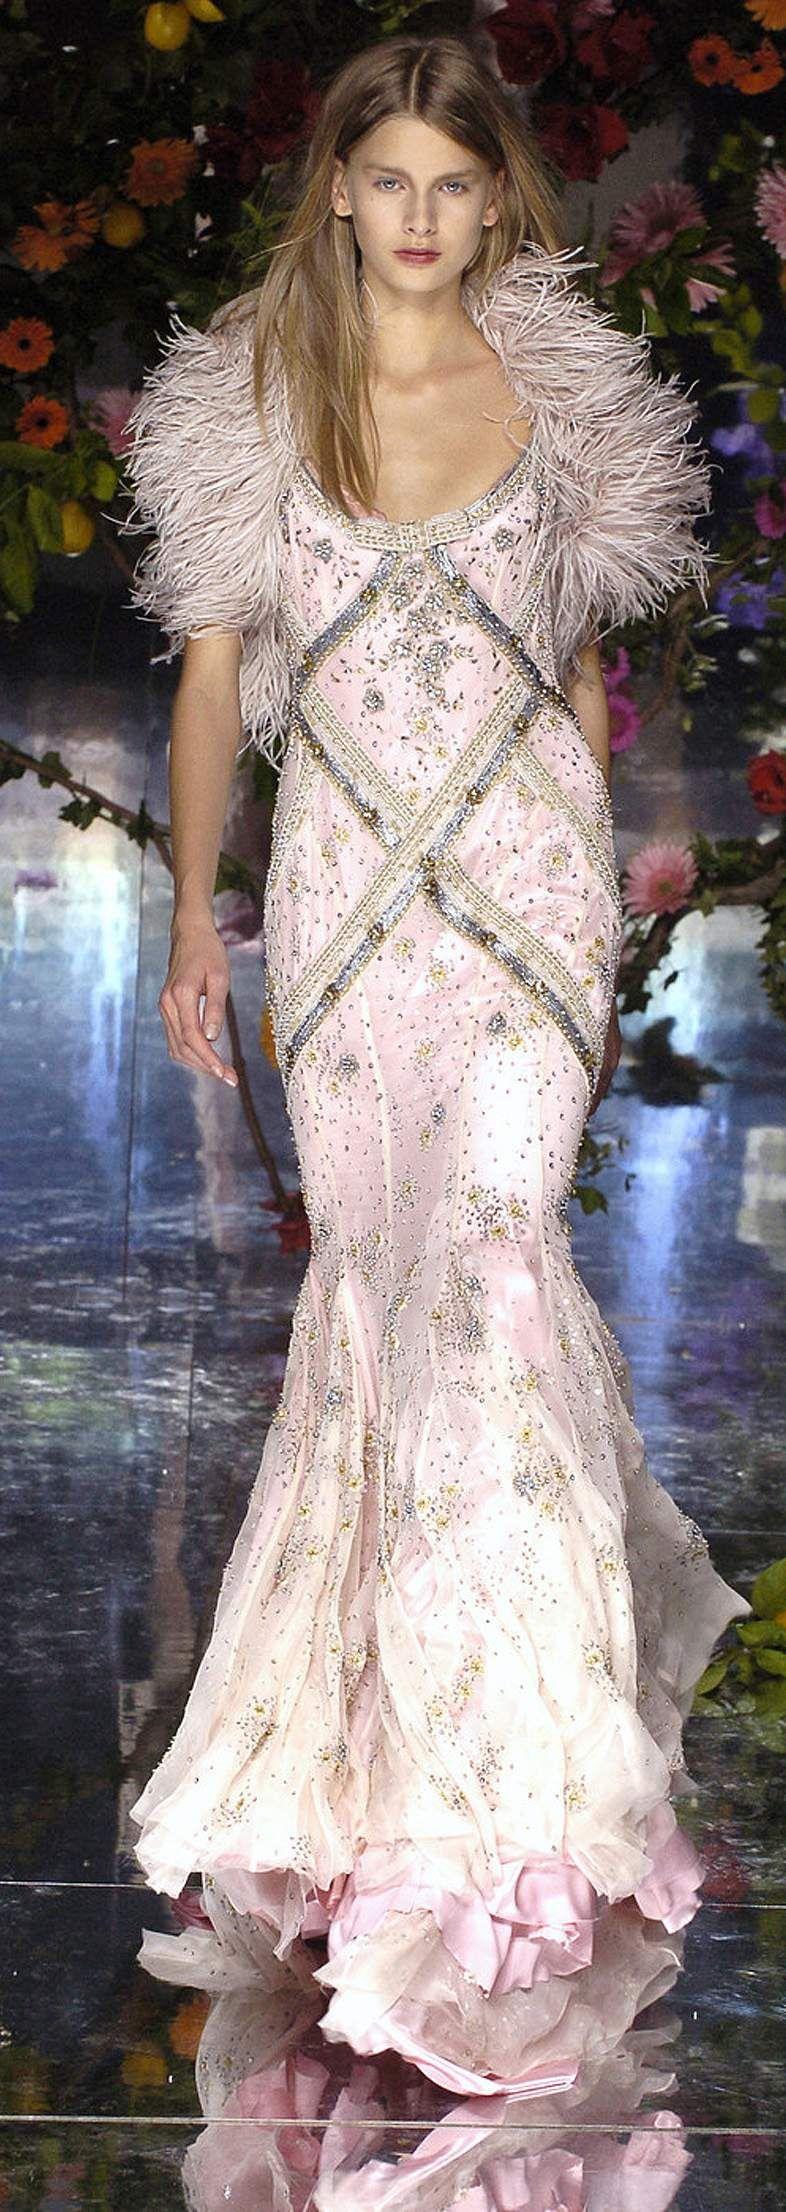 Dolce & Gabbana Spring 2004